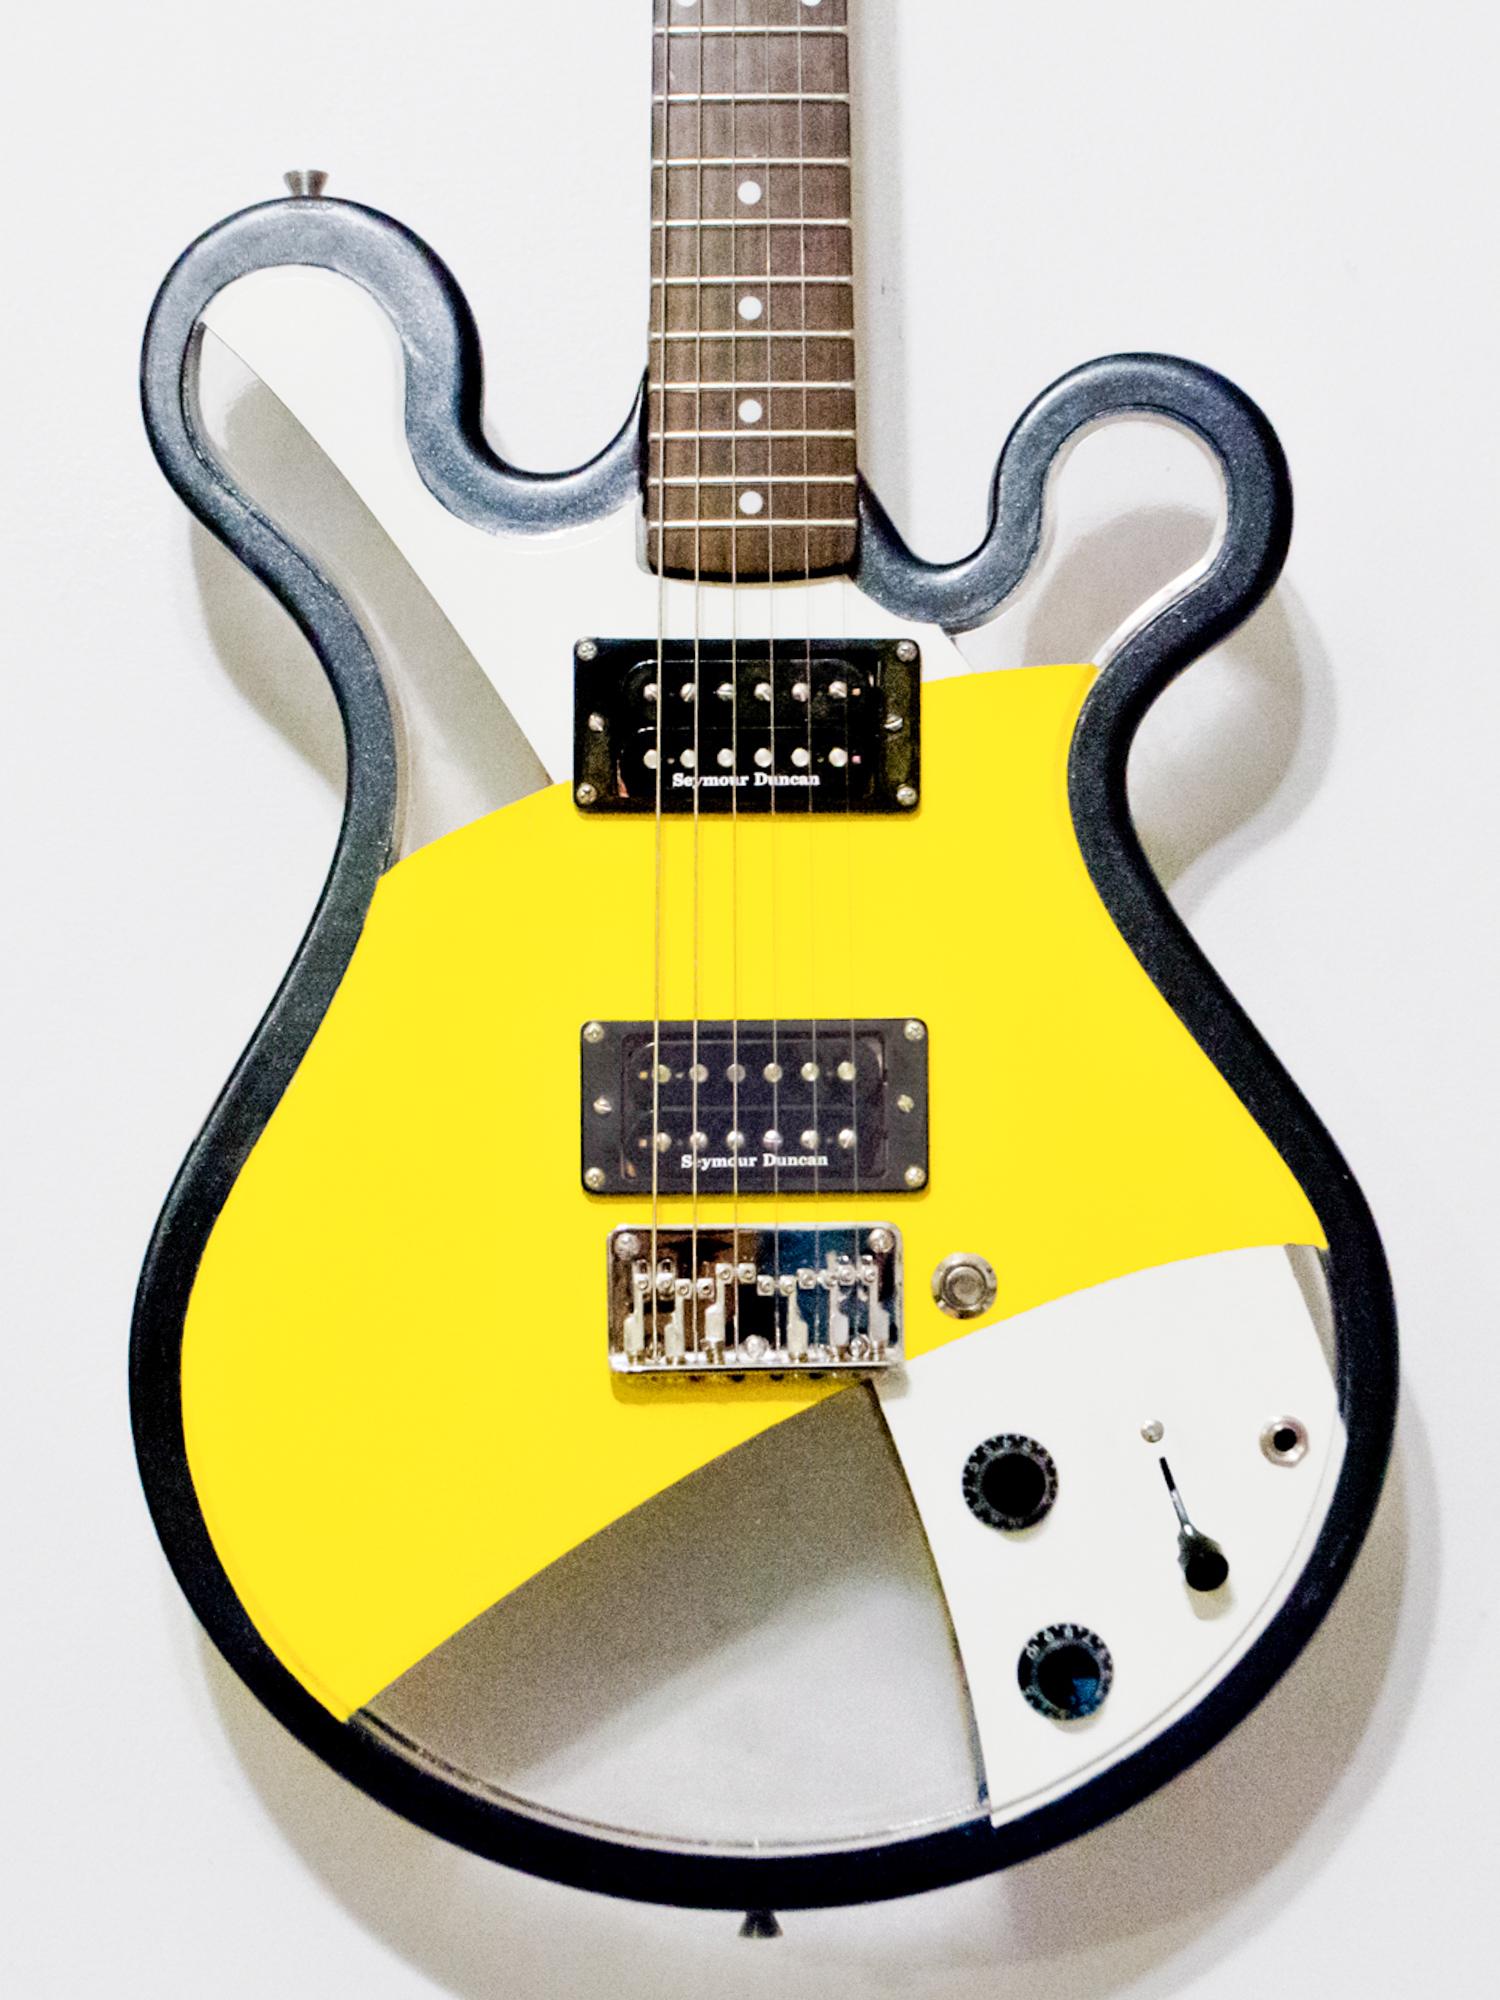 Gallo_Guitar_Loop_Black_White_Yellow_LED.jpg